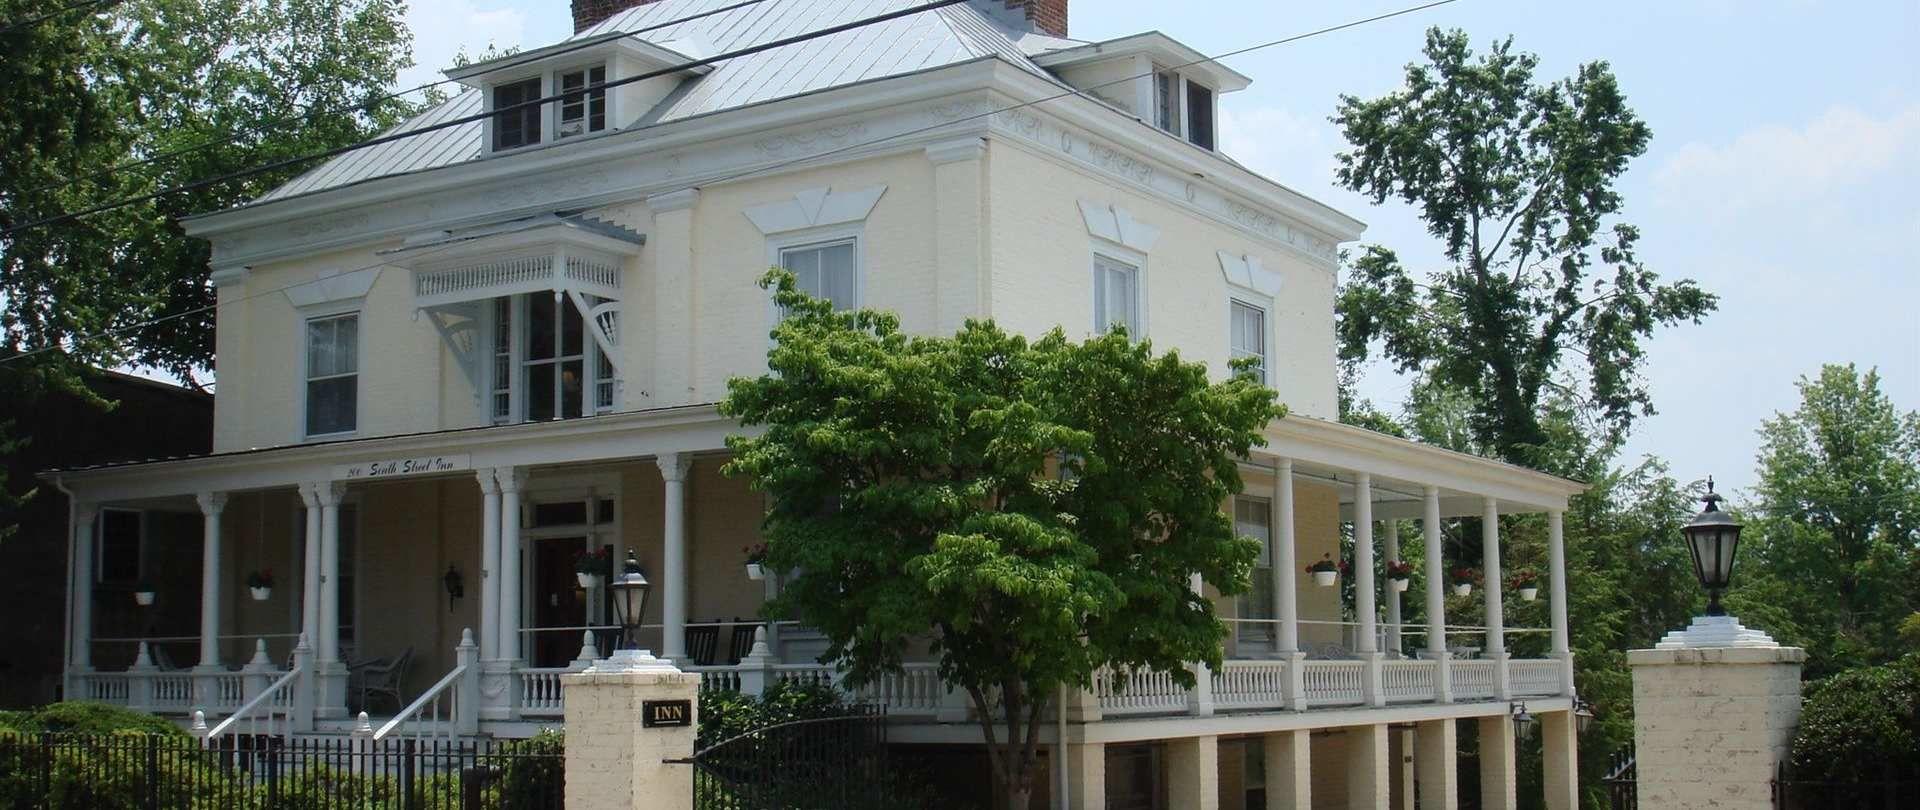 200 South Street Inn